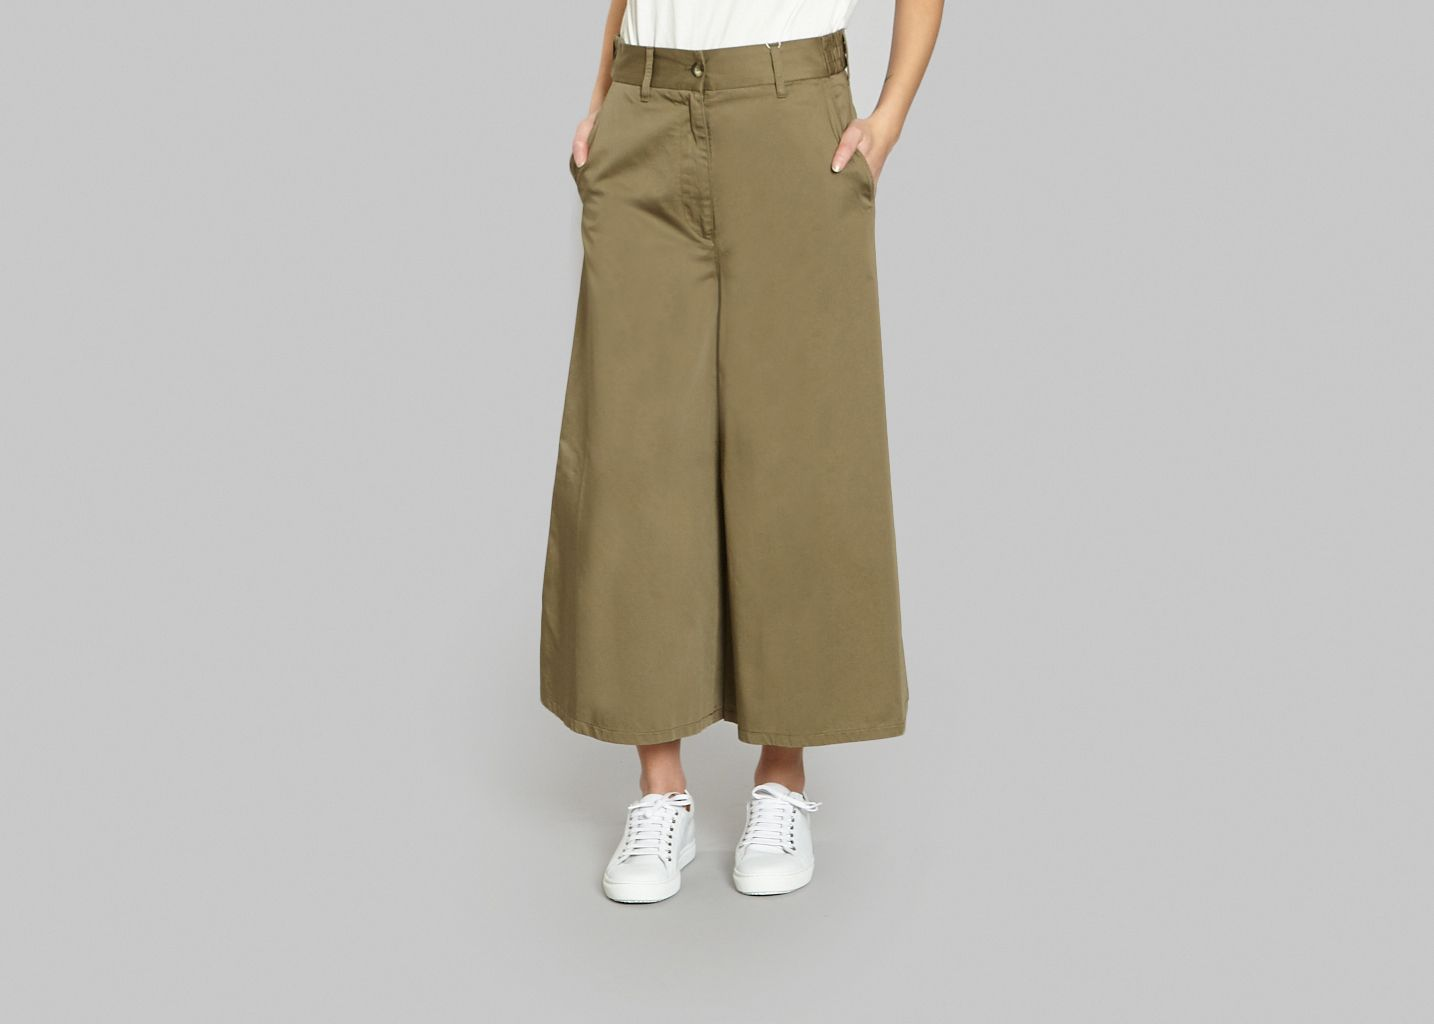 Pantalon Jupe Culotte - MM6